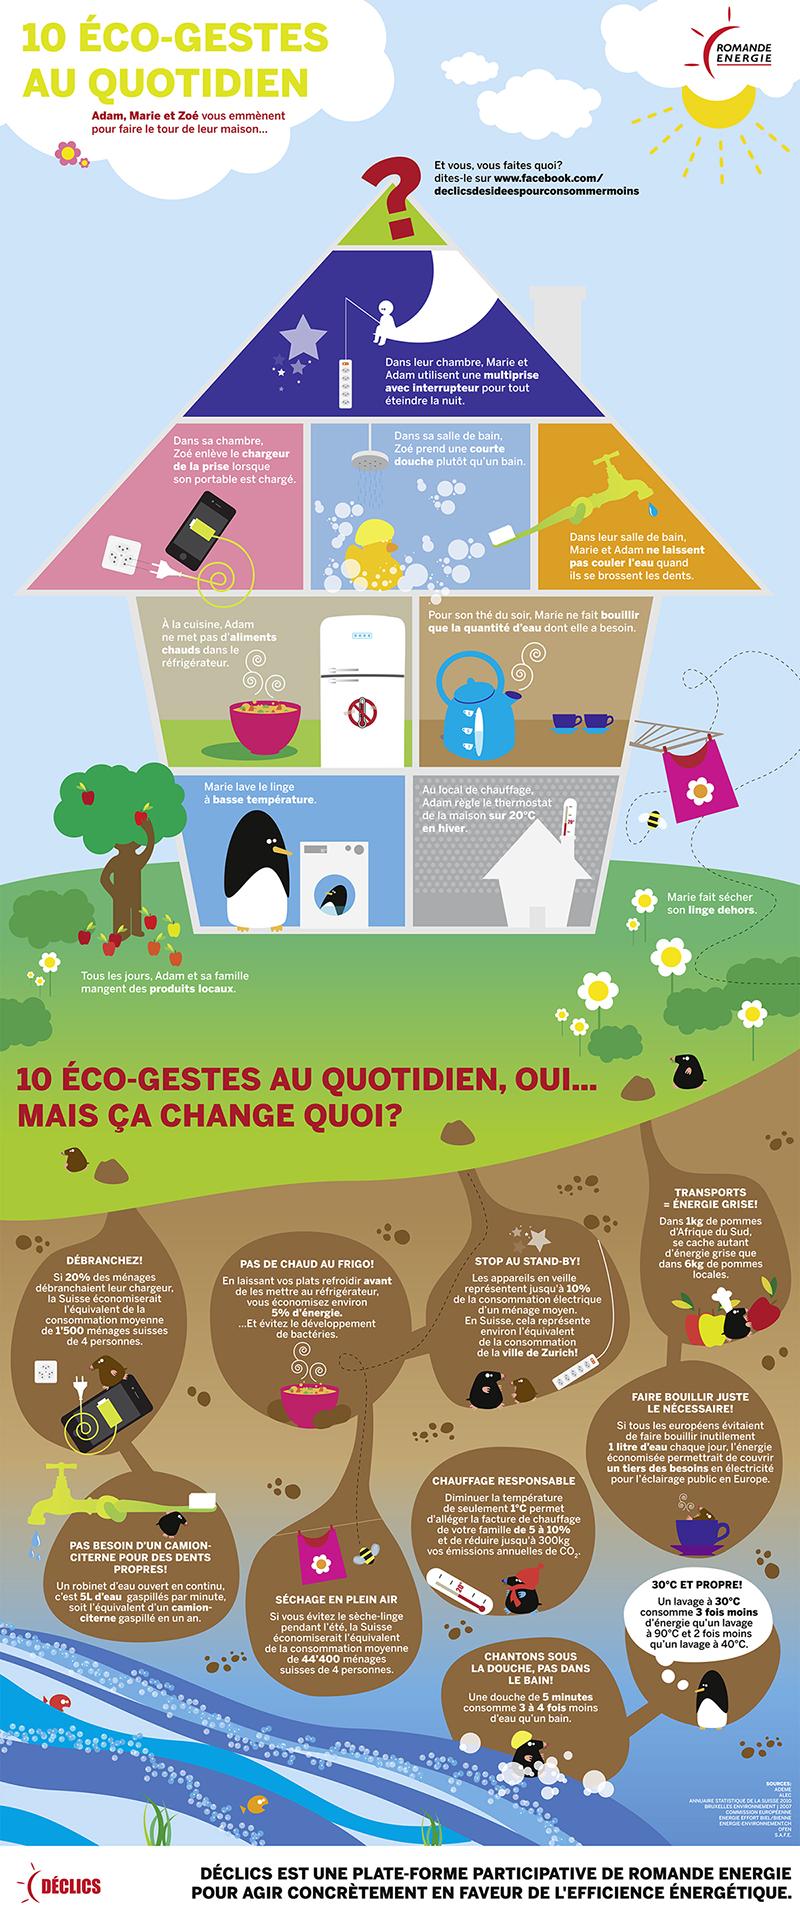 Célèbre http://declics.romande-energie.ch/articles/10-eco-gestes-au  UX38